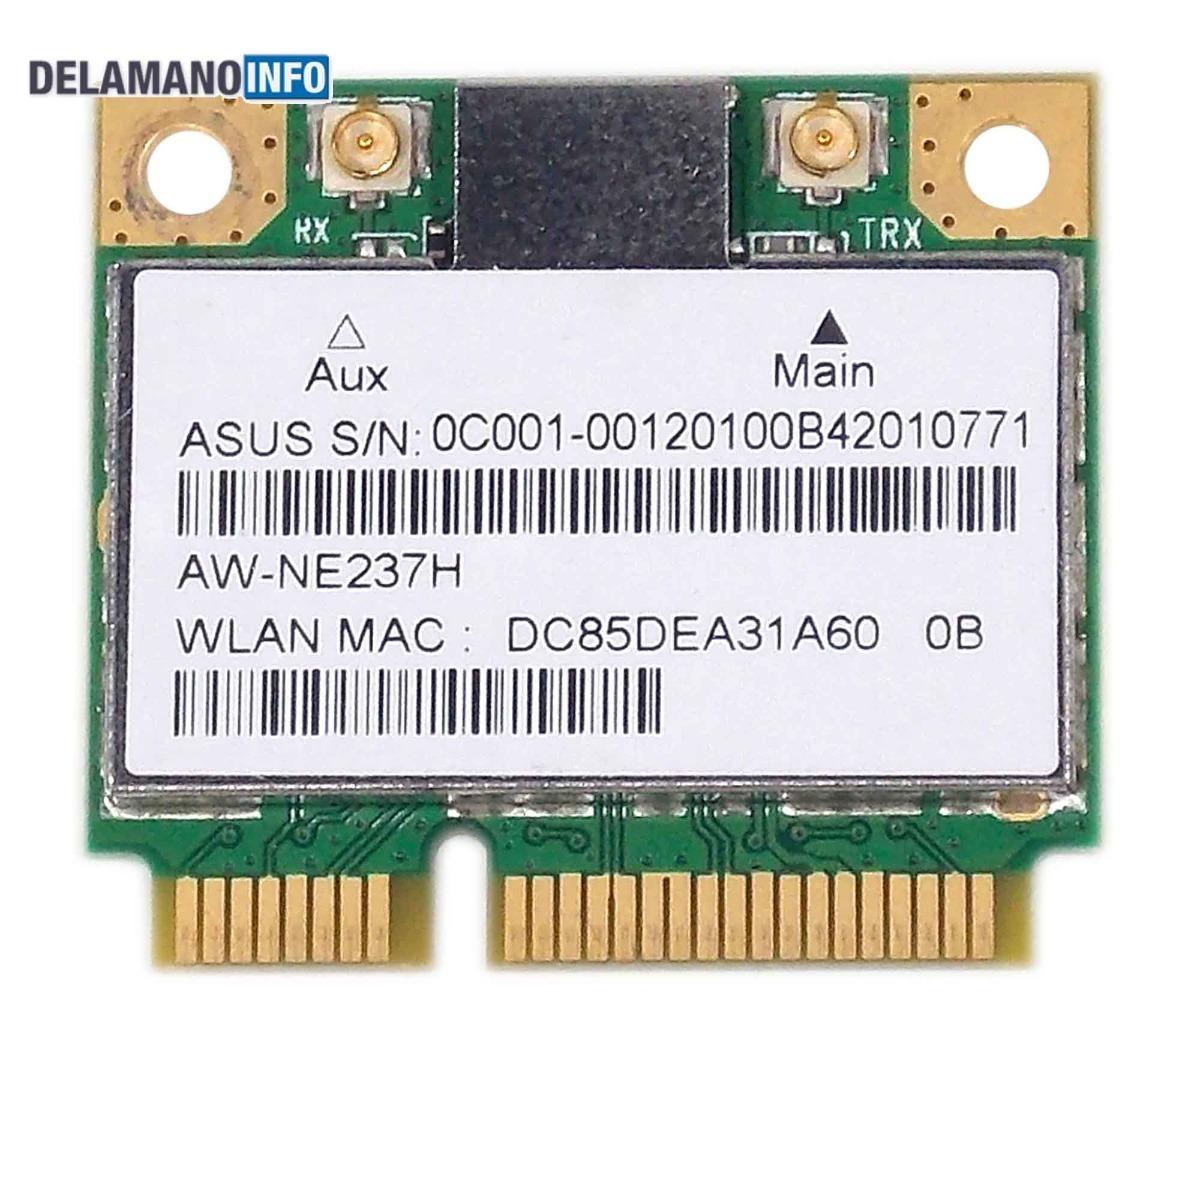 ASUS X45A Qualcomm Atheros WLAN Treiber Windows XP